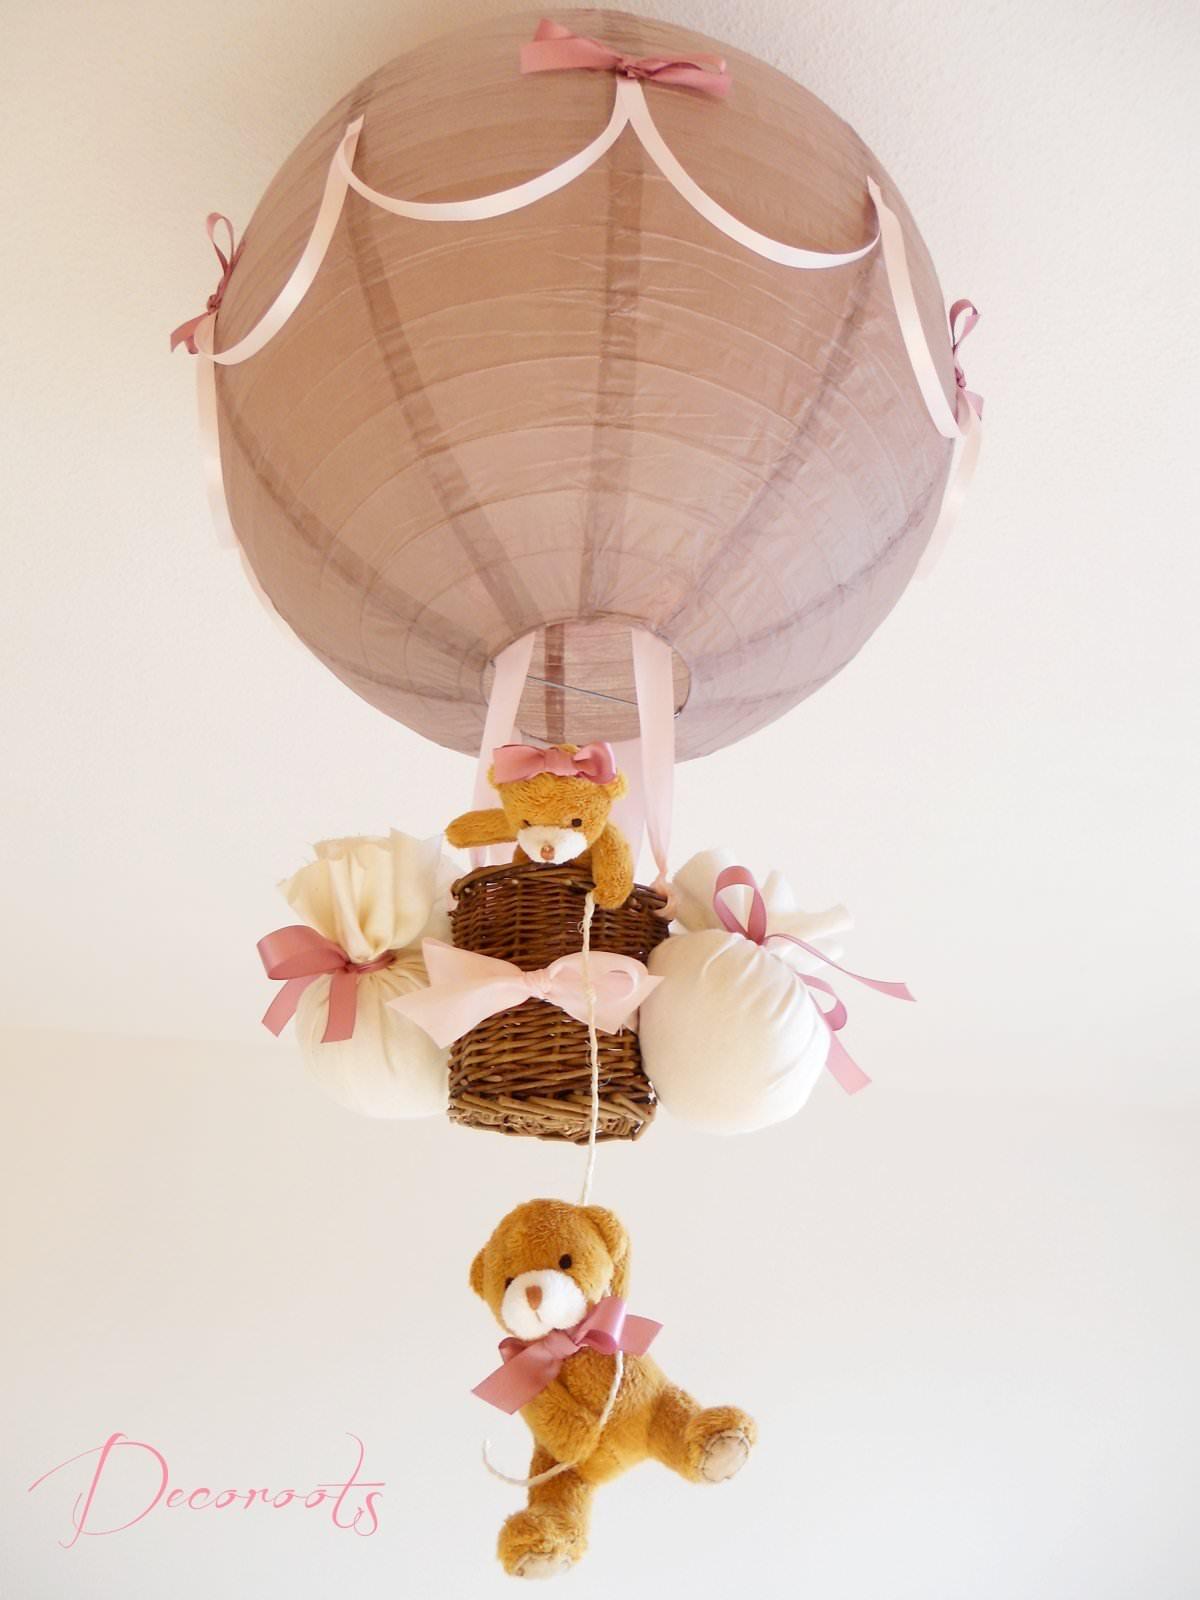 lampe montgolfi re fille taupe et rose enfant b b luminaire enfant b b decoroots. Black Bedroom Furniture Sets. Home Design Ideas